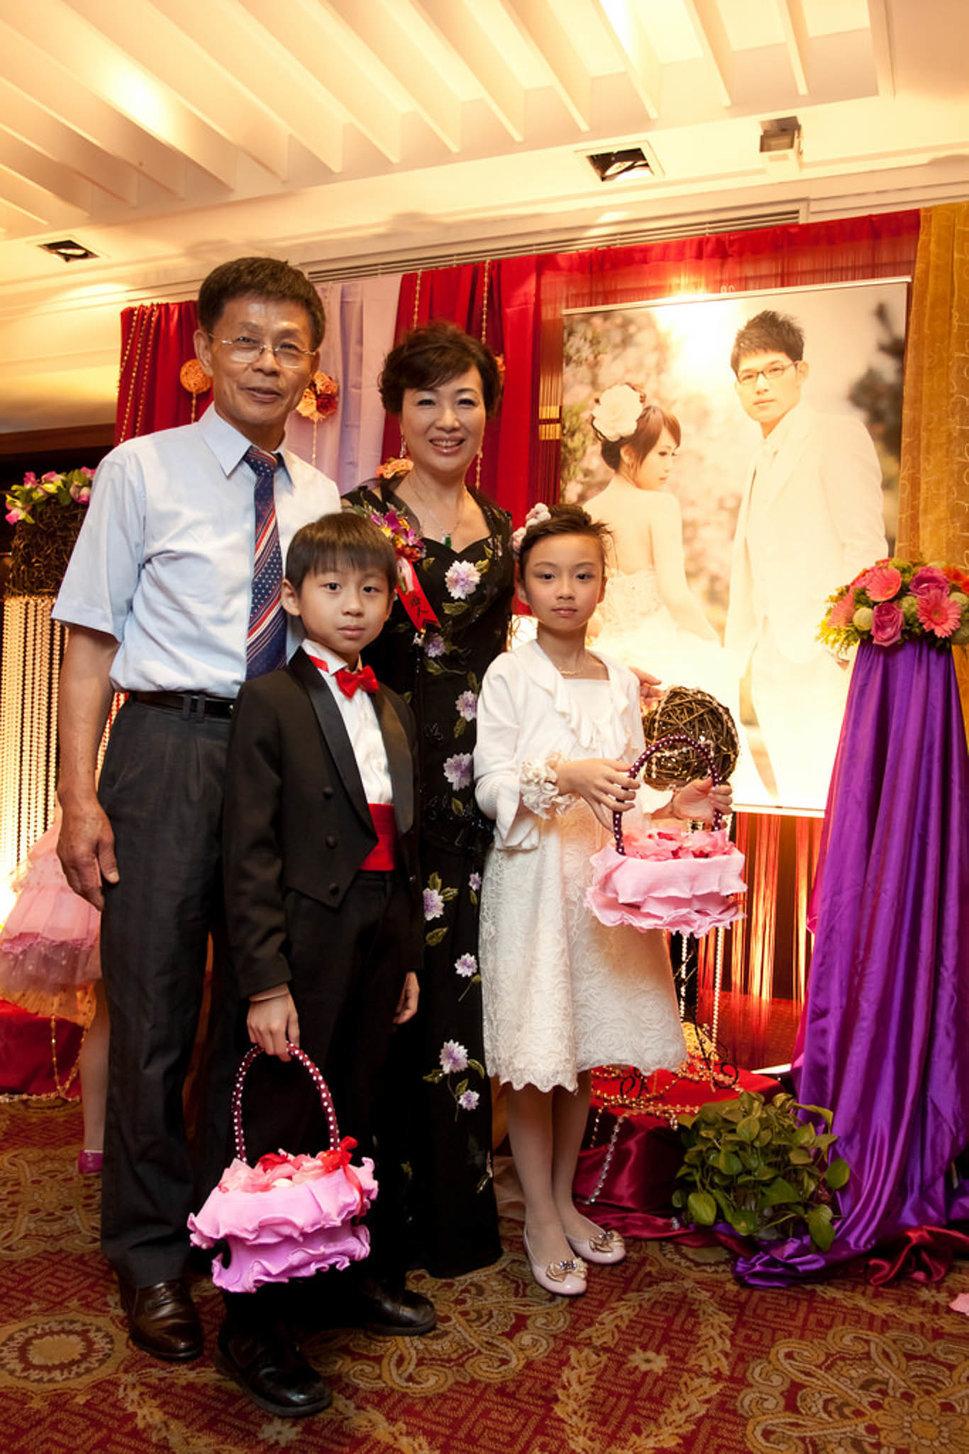 18PHOTO-佳成❤️ 玨萍(編號:220199) - 18 PHOTO 影像攝影工作室 - 結婚吧一站式婚禮服務平台